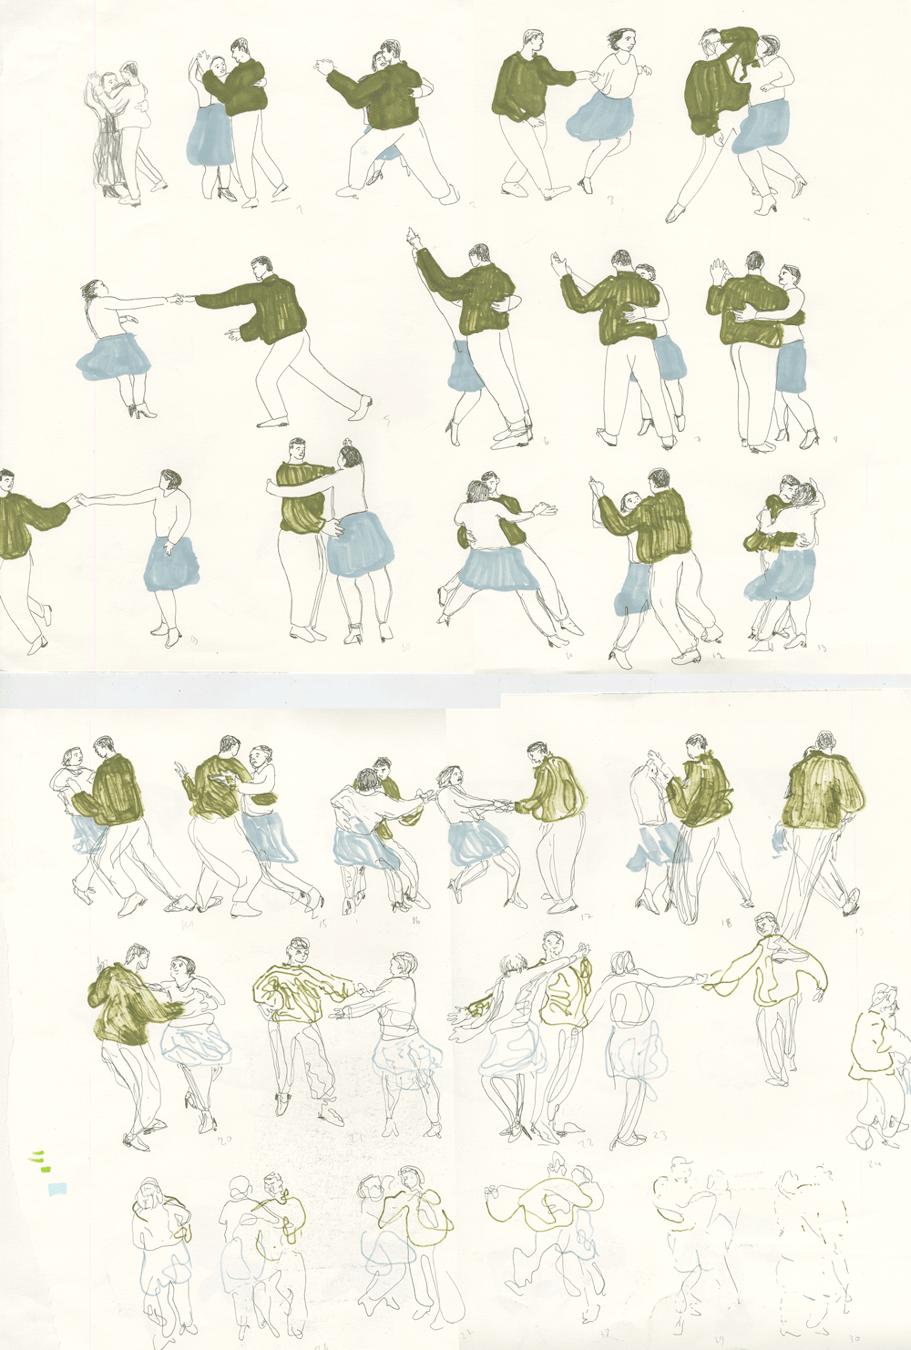 Tanz Sketch